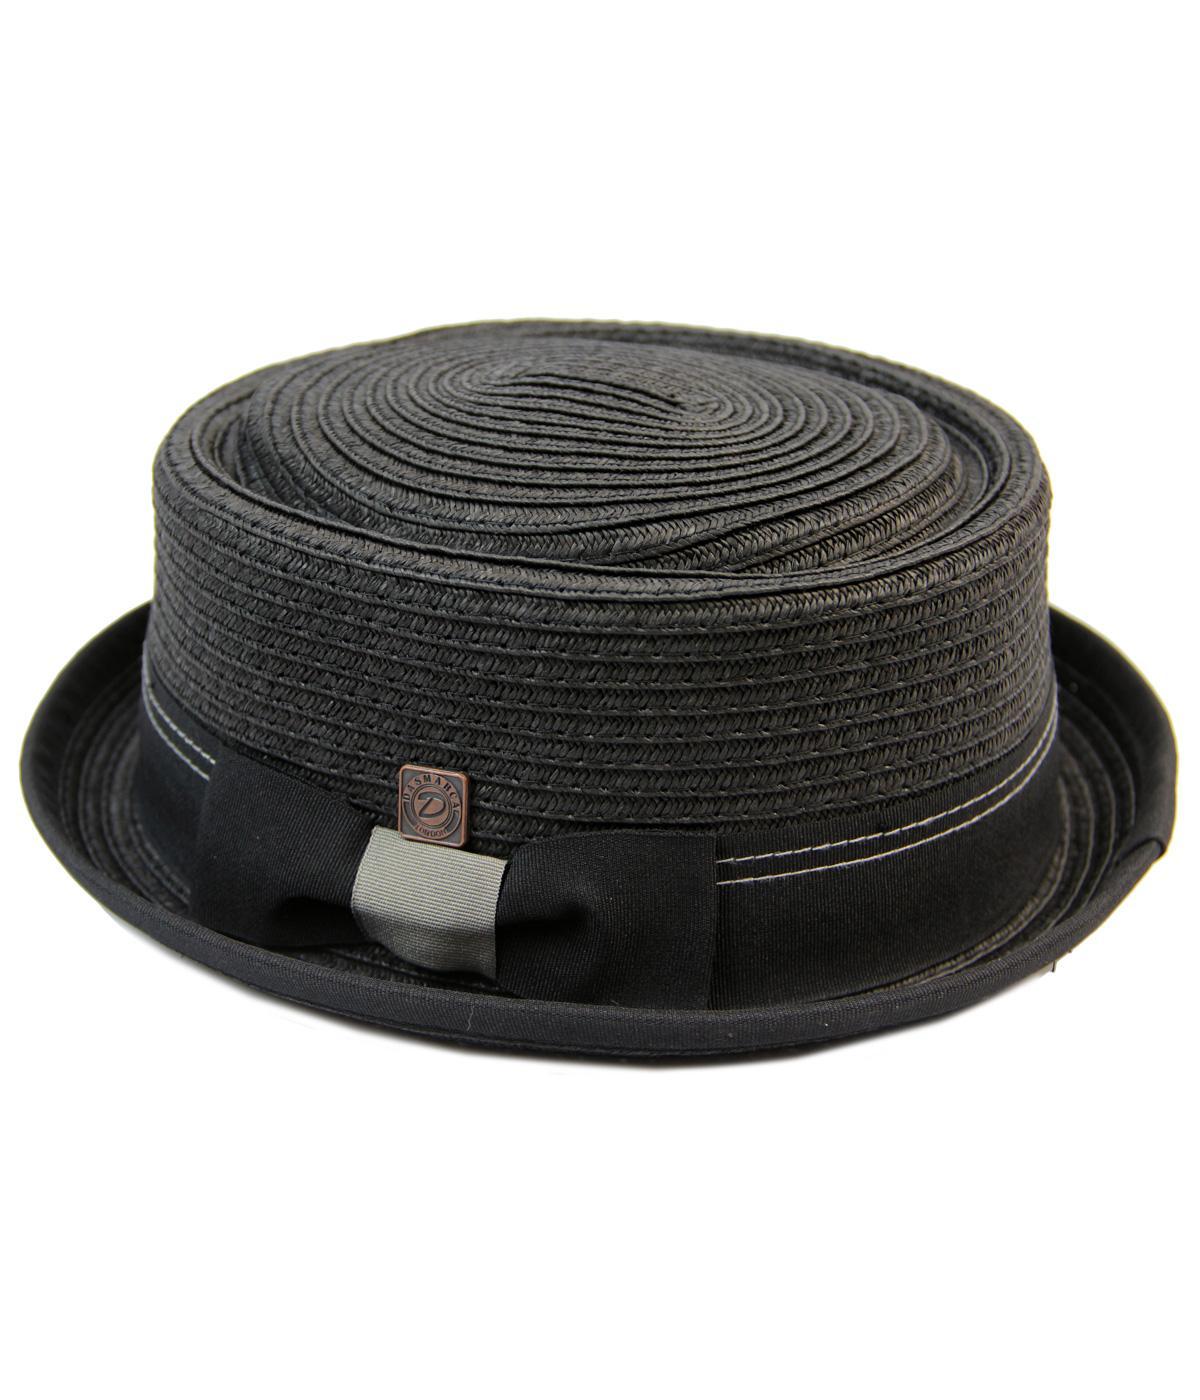 Rico DASMARCA Retro Mod Weave Pork Pie Hat